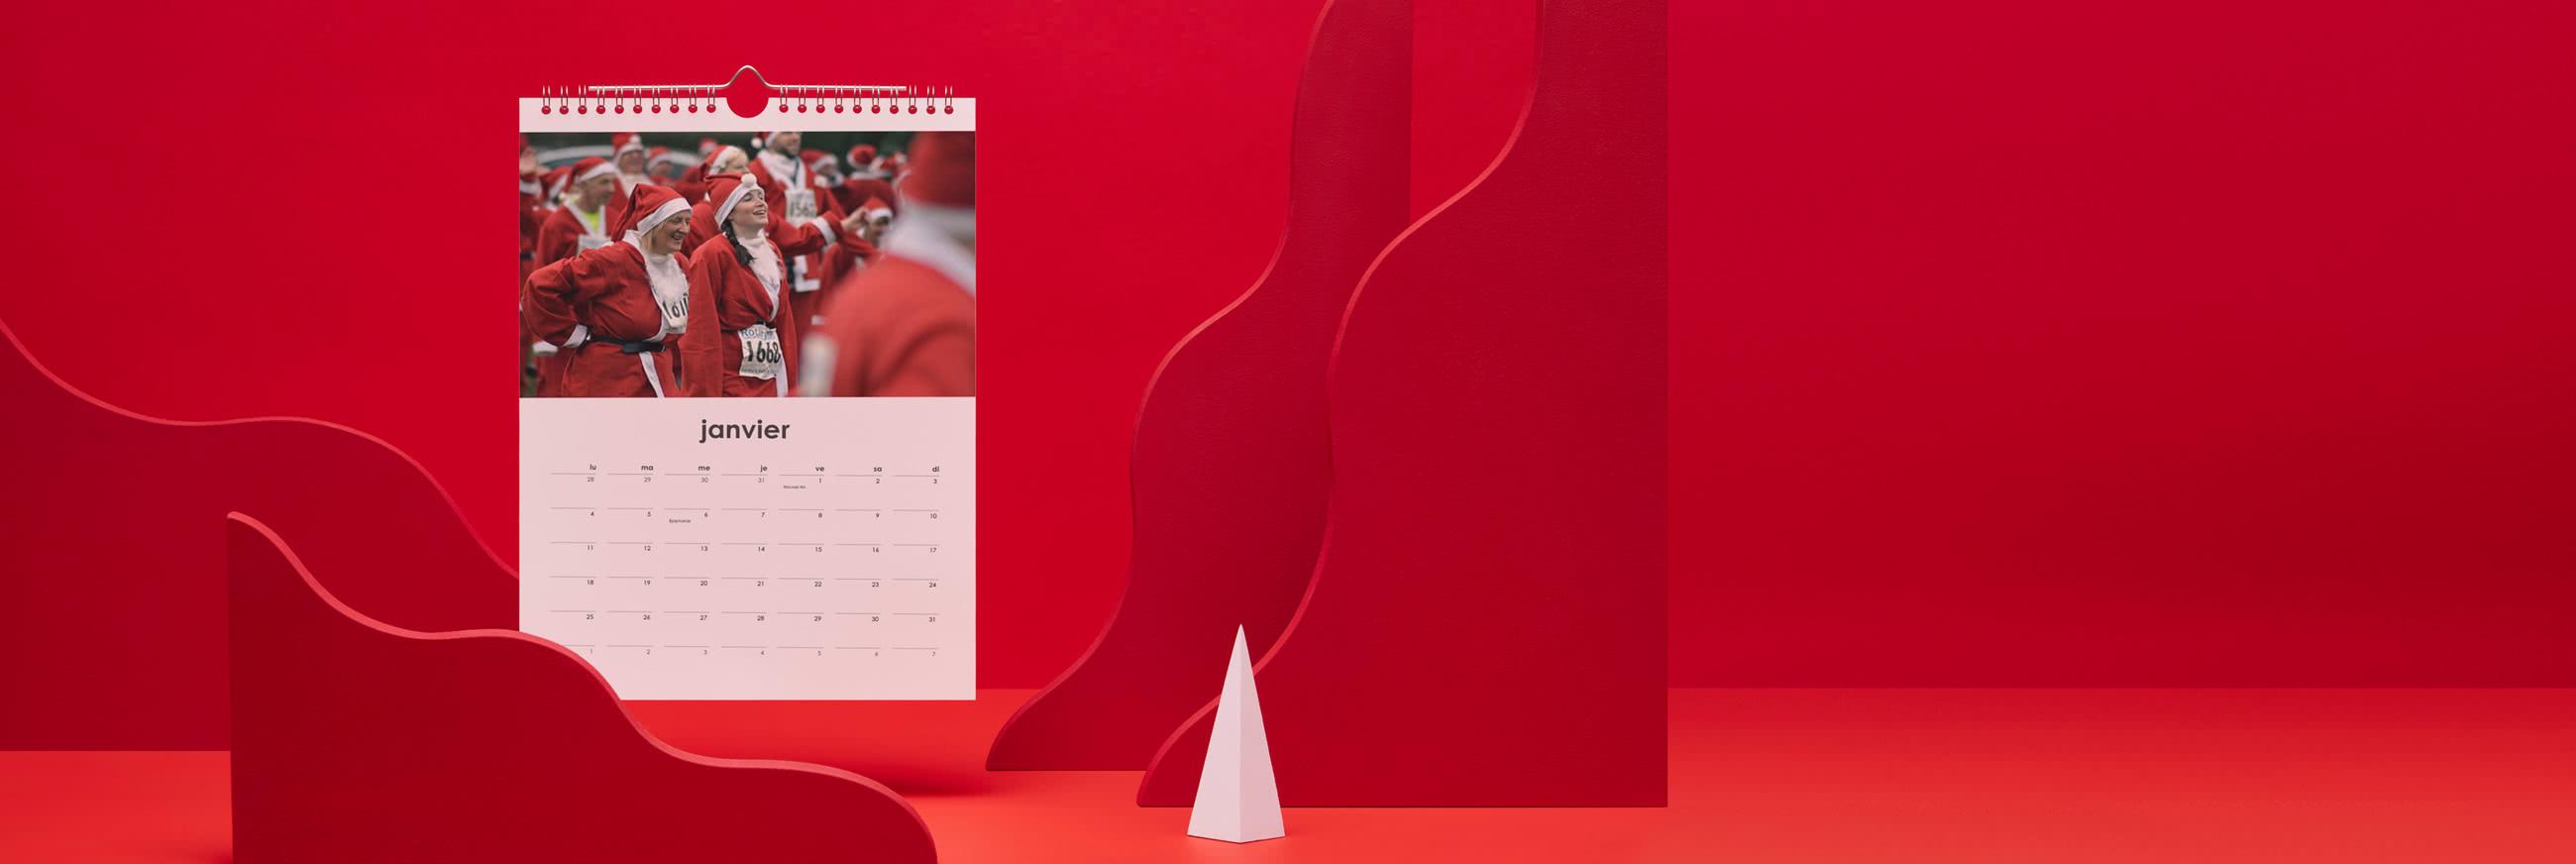 Calendriers Photo Muraux A4 & A3 Simples 2021 | Photobox